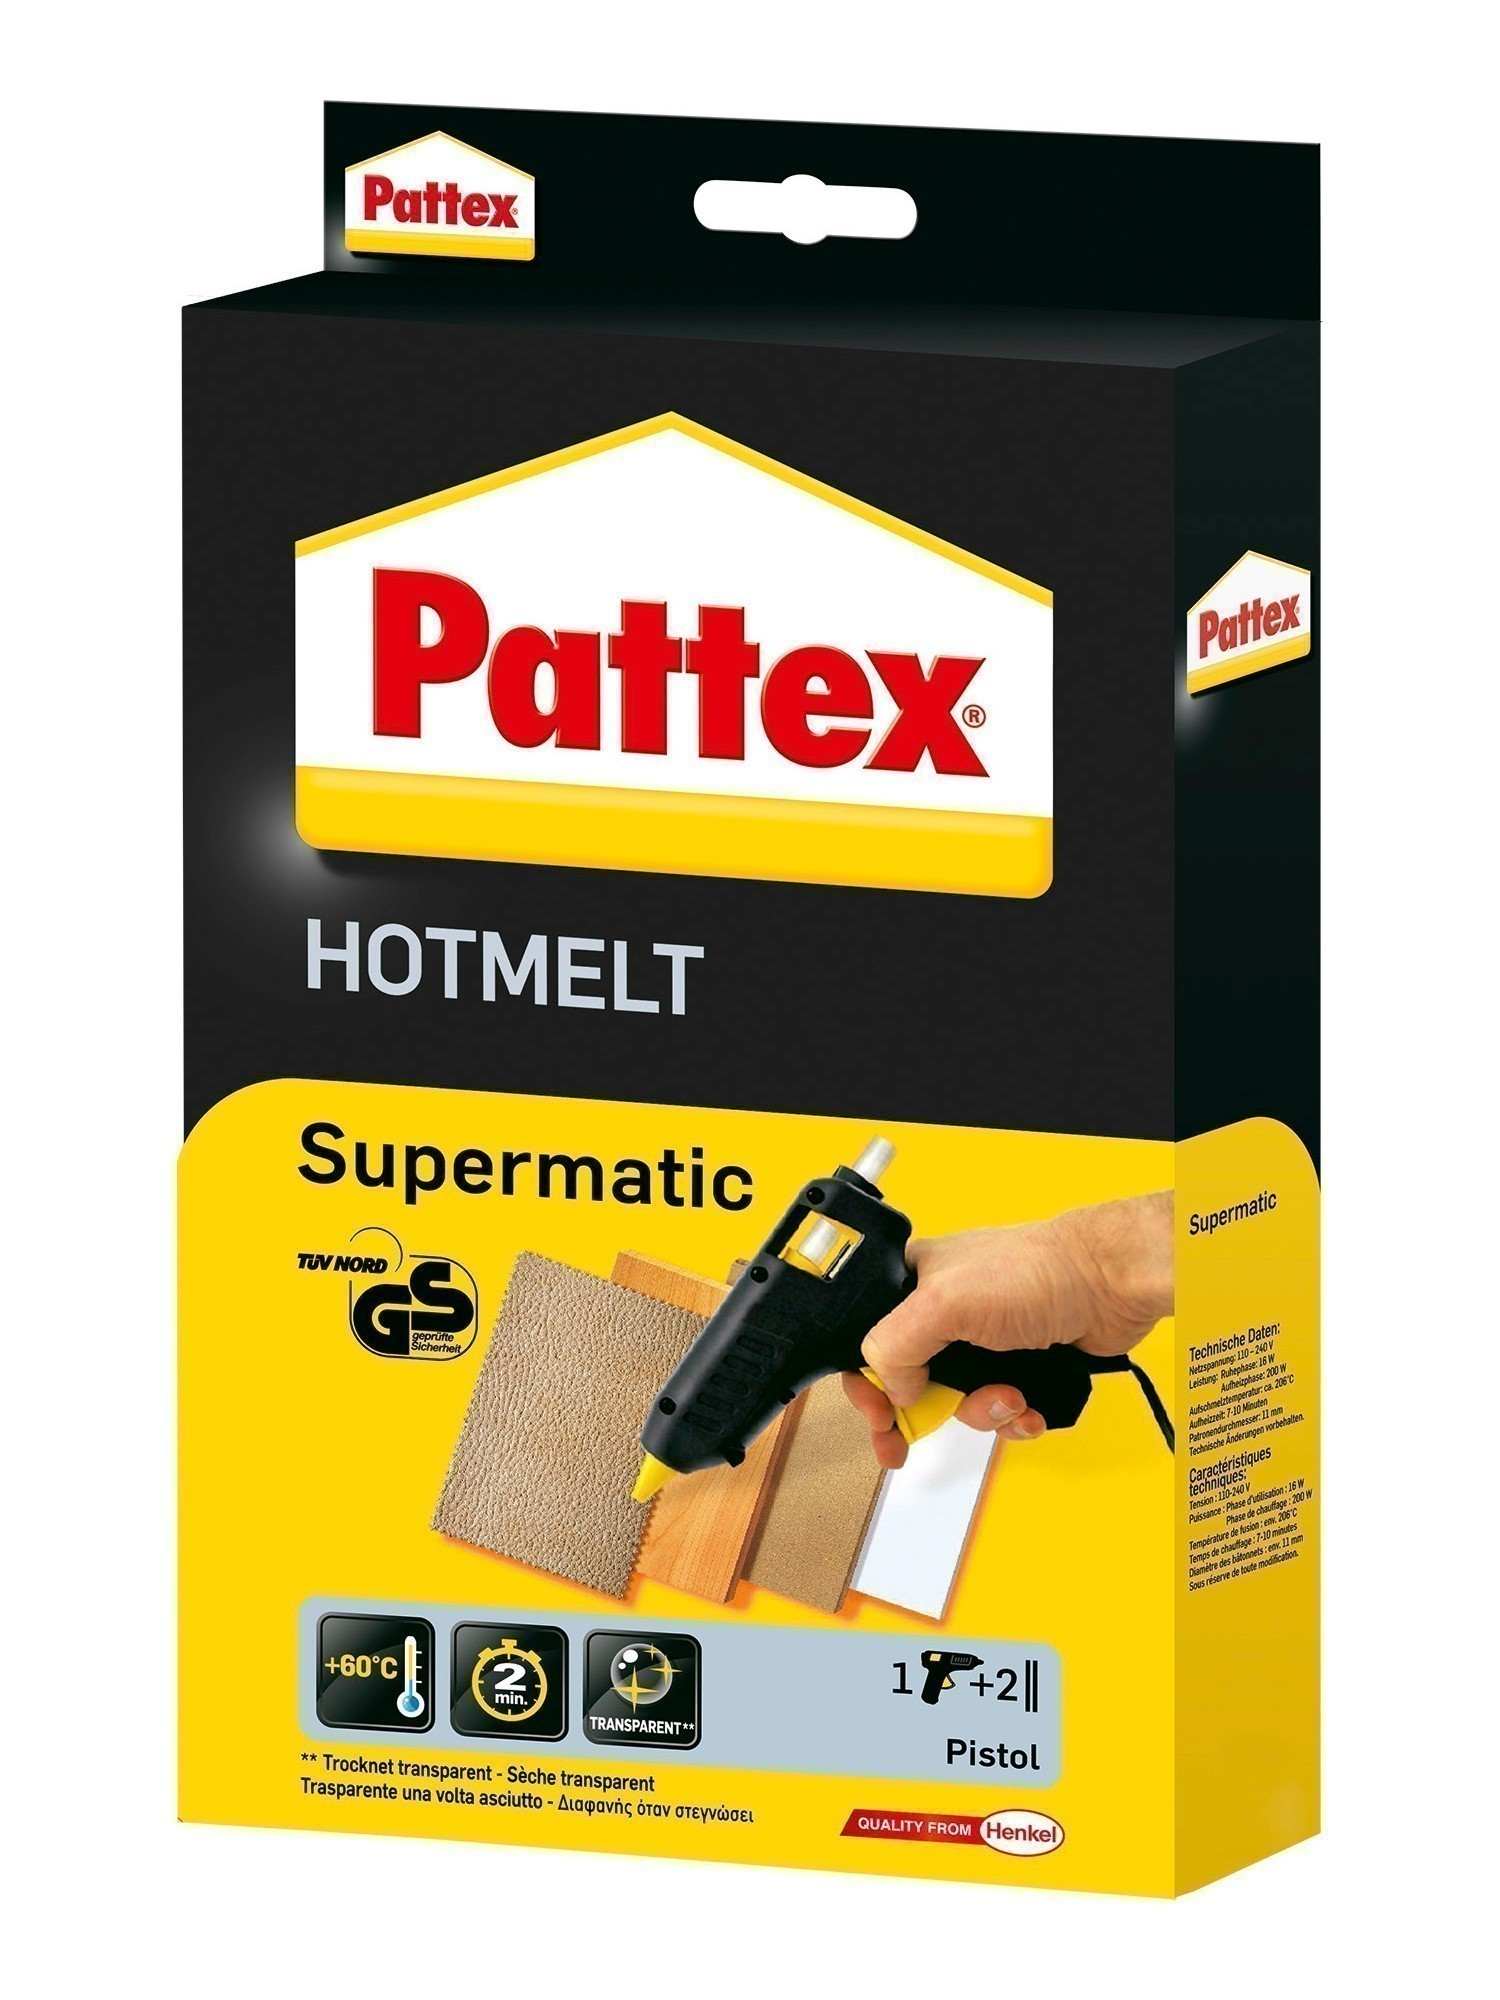 Pattex Heißkleber HOTMELT Supermatic / Heißklebepistole 1 Stück Bild 1